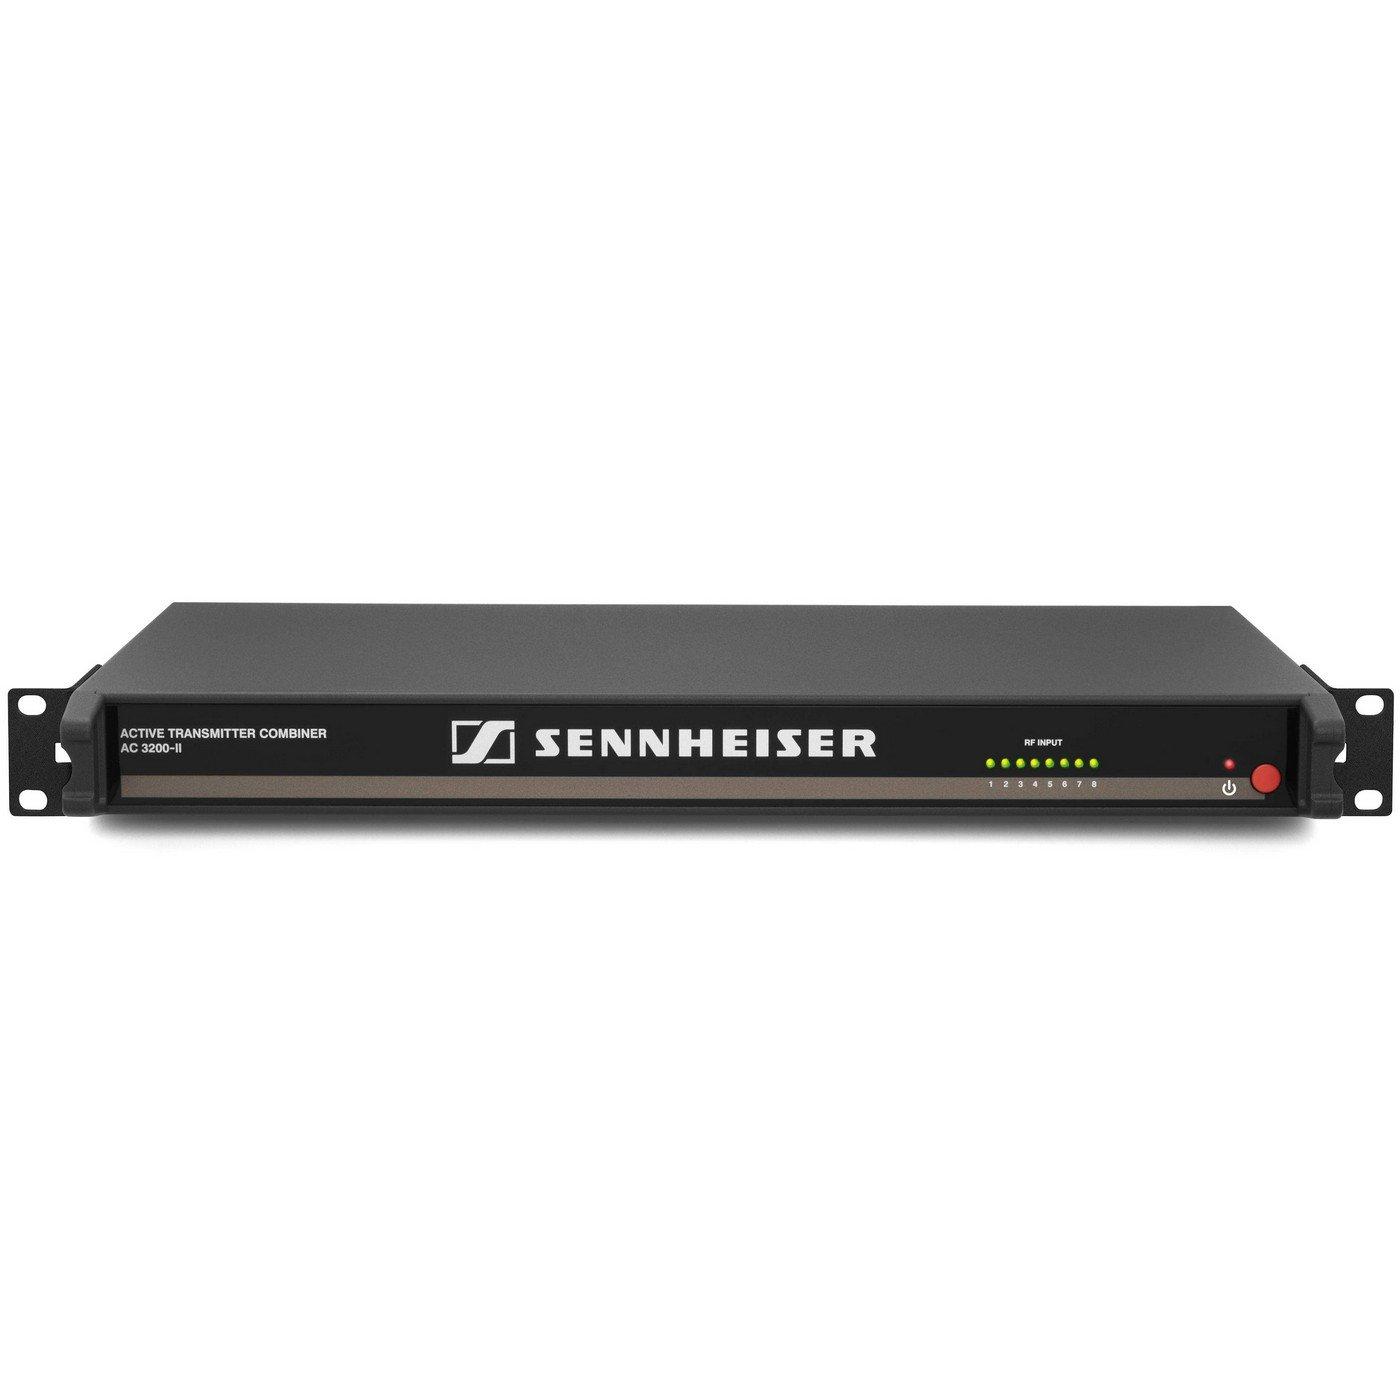 Sennheiser AC3200-II | 250mW High Power 8:1 Active Antenna Combiner 505497